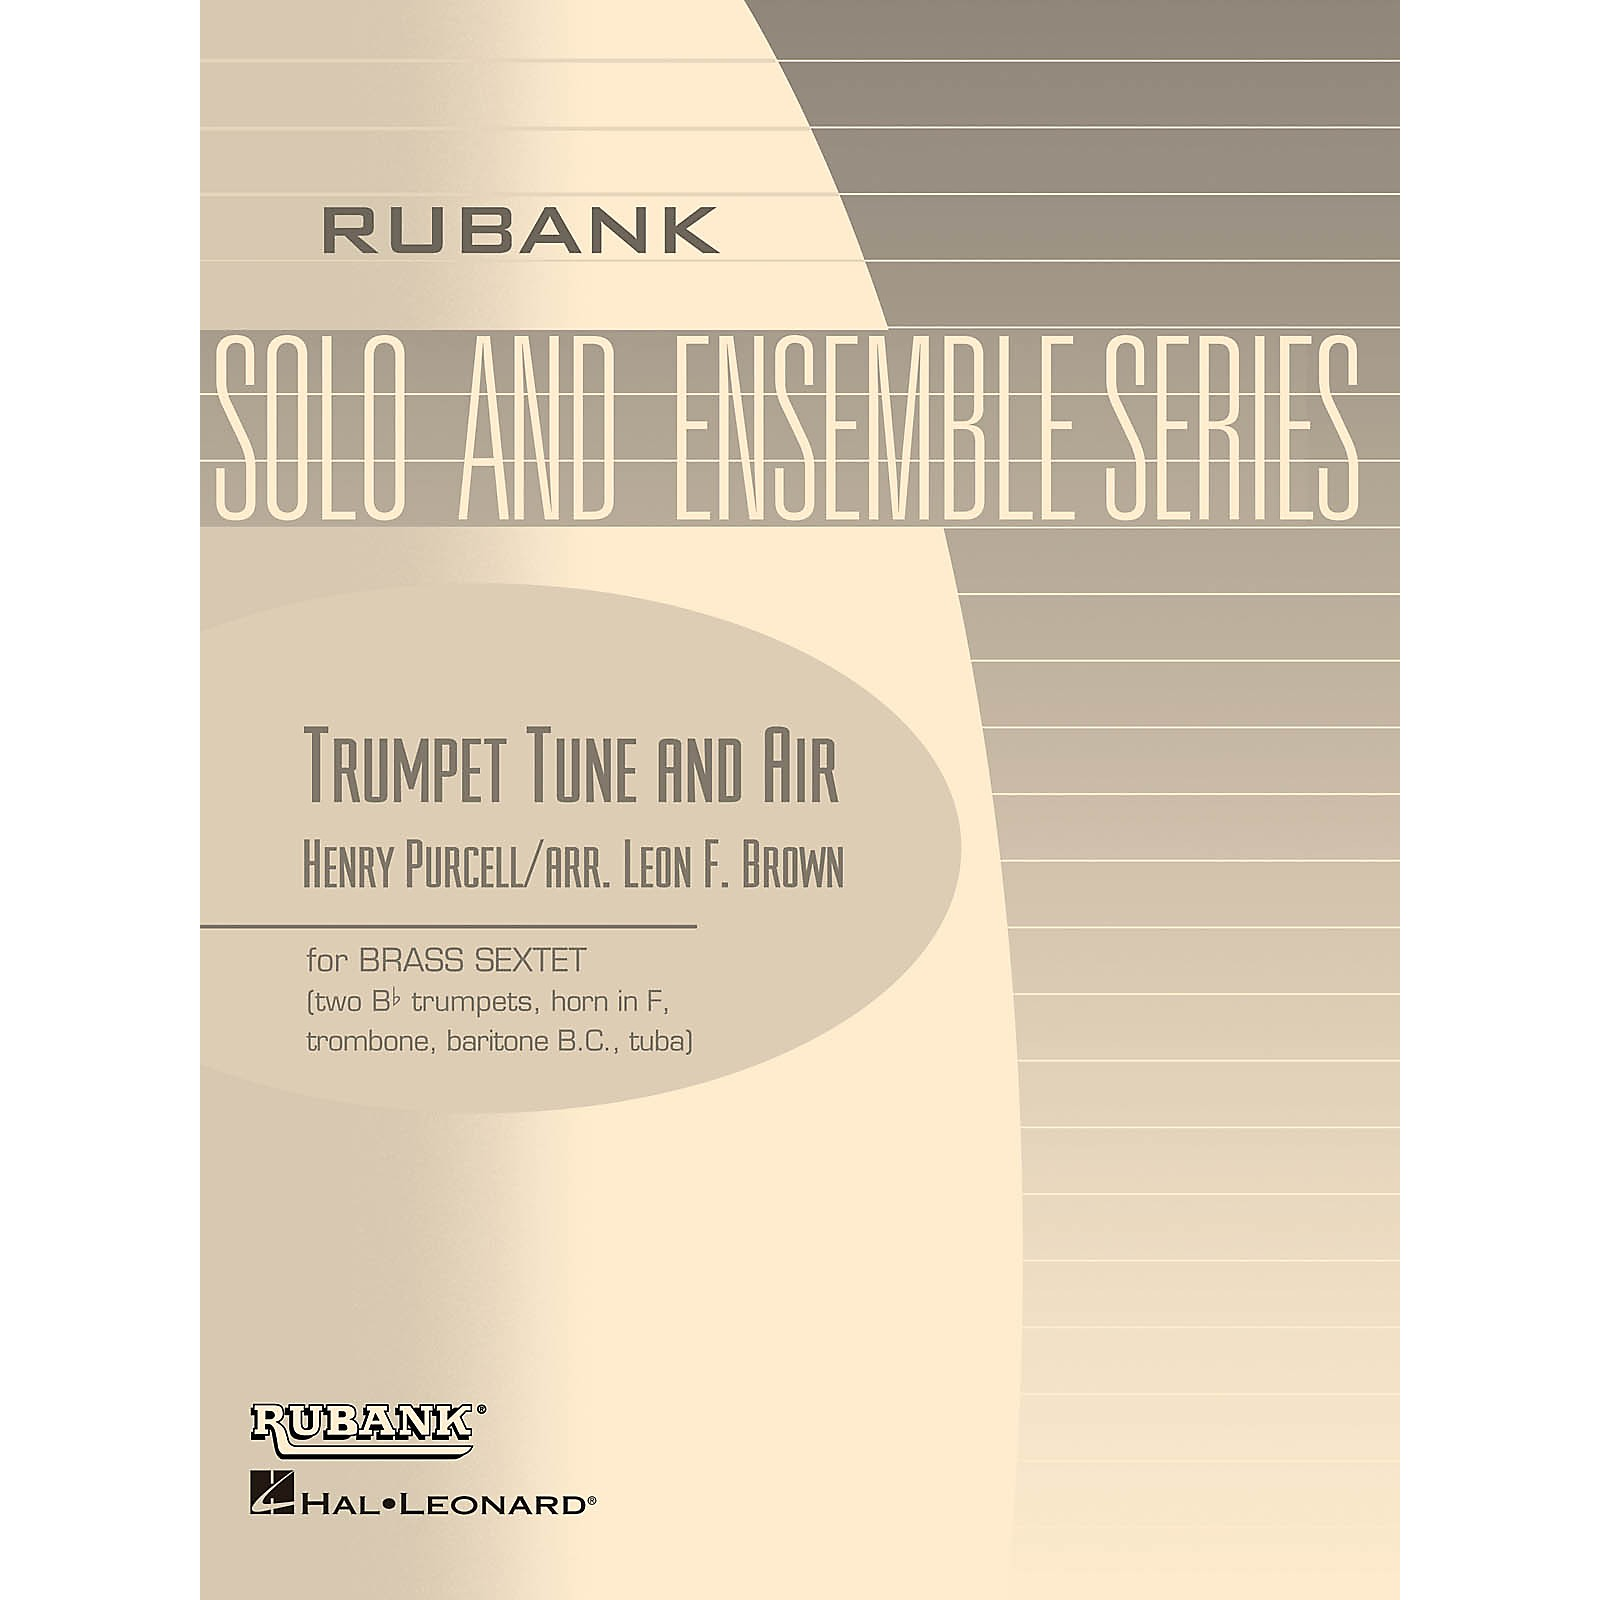 Rubank Publications Trumpet Tune and Air (Brass Sextet - Grade 2) Rubank Solo/Ensemble Sheet Series